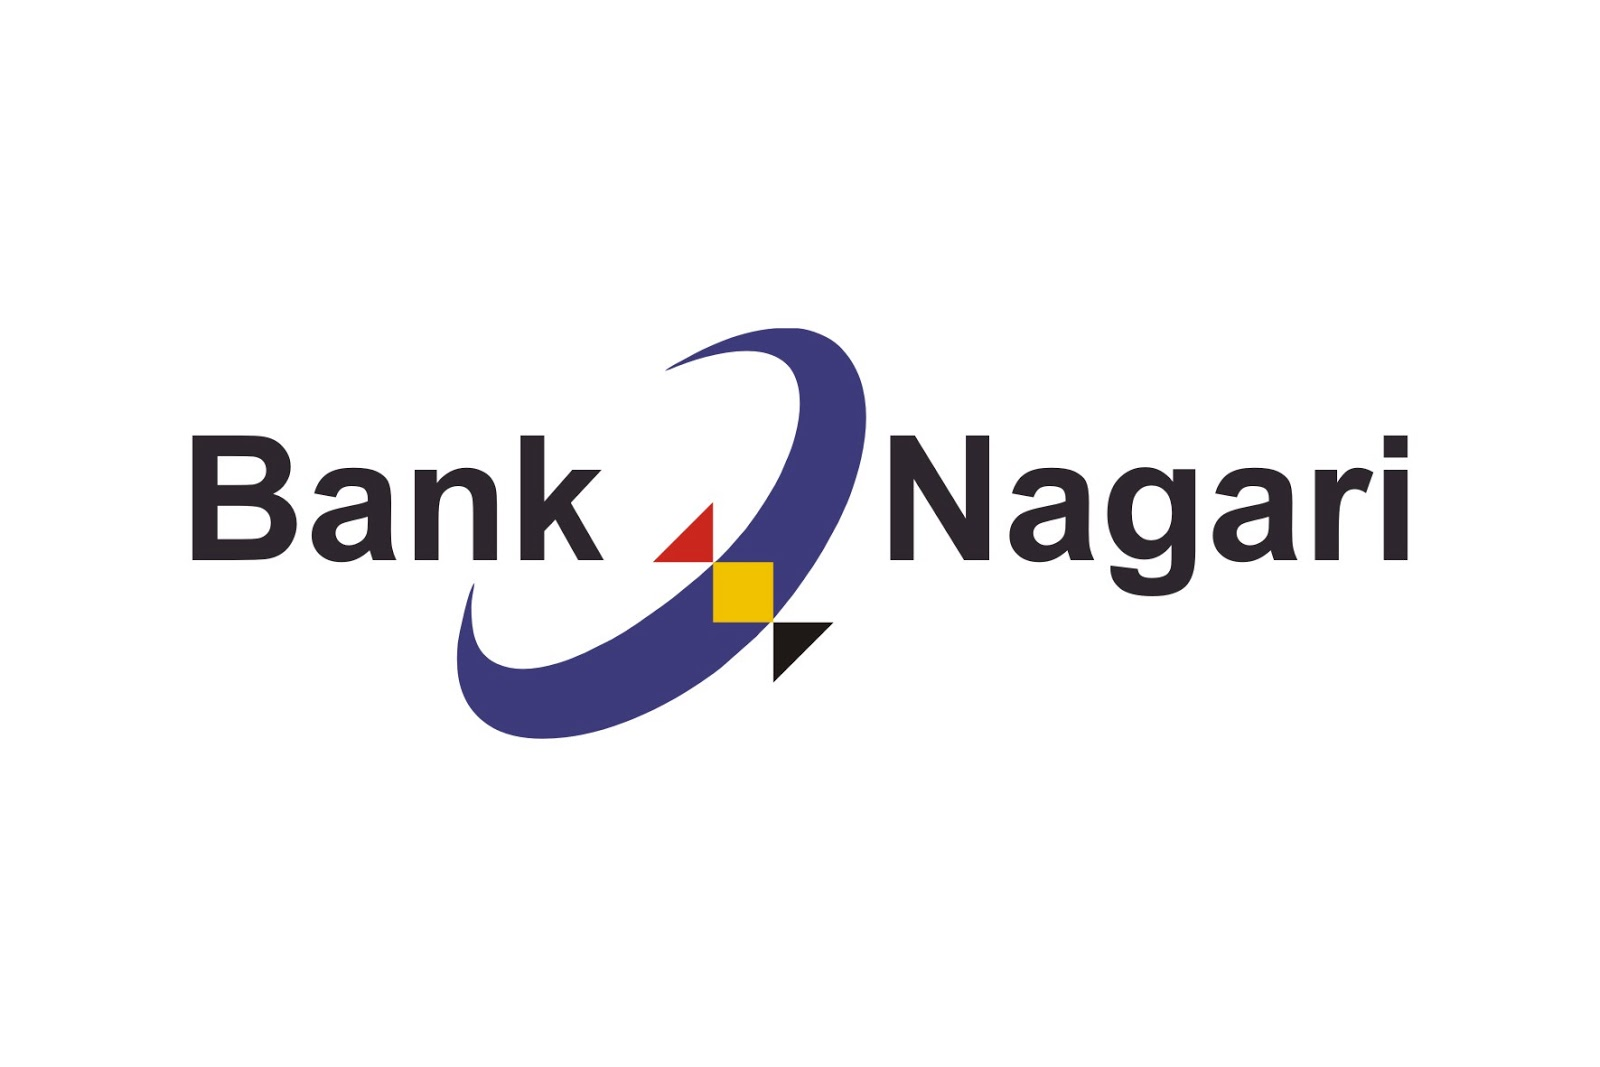 Bank Nagari Logo photo - 1